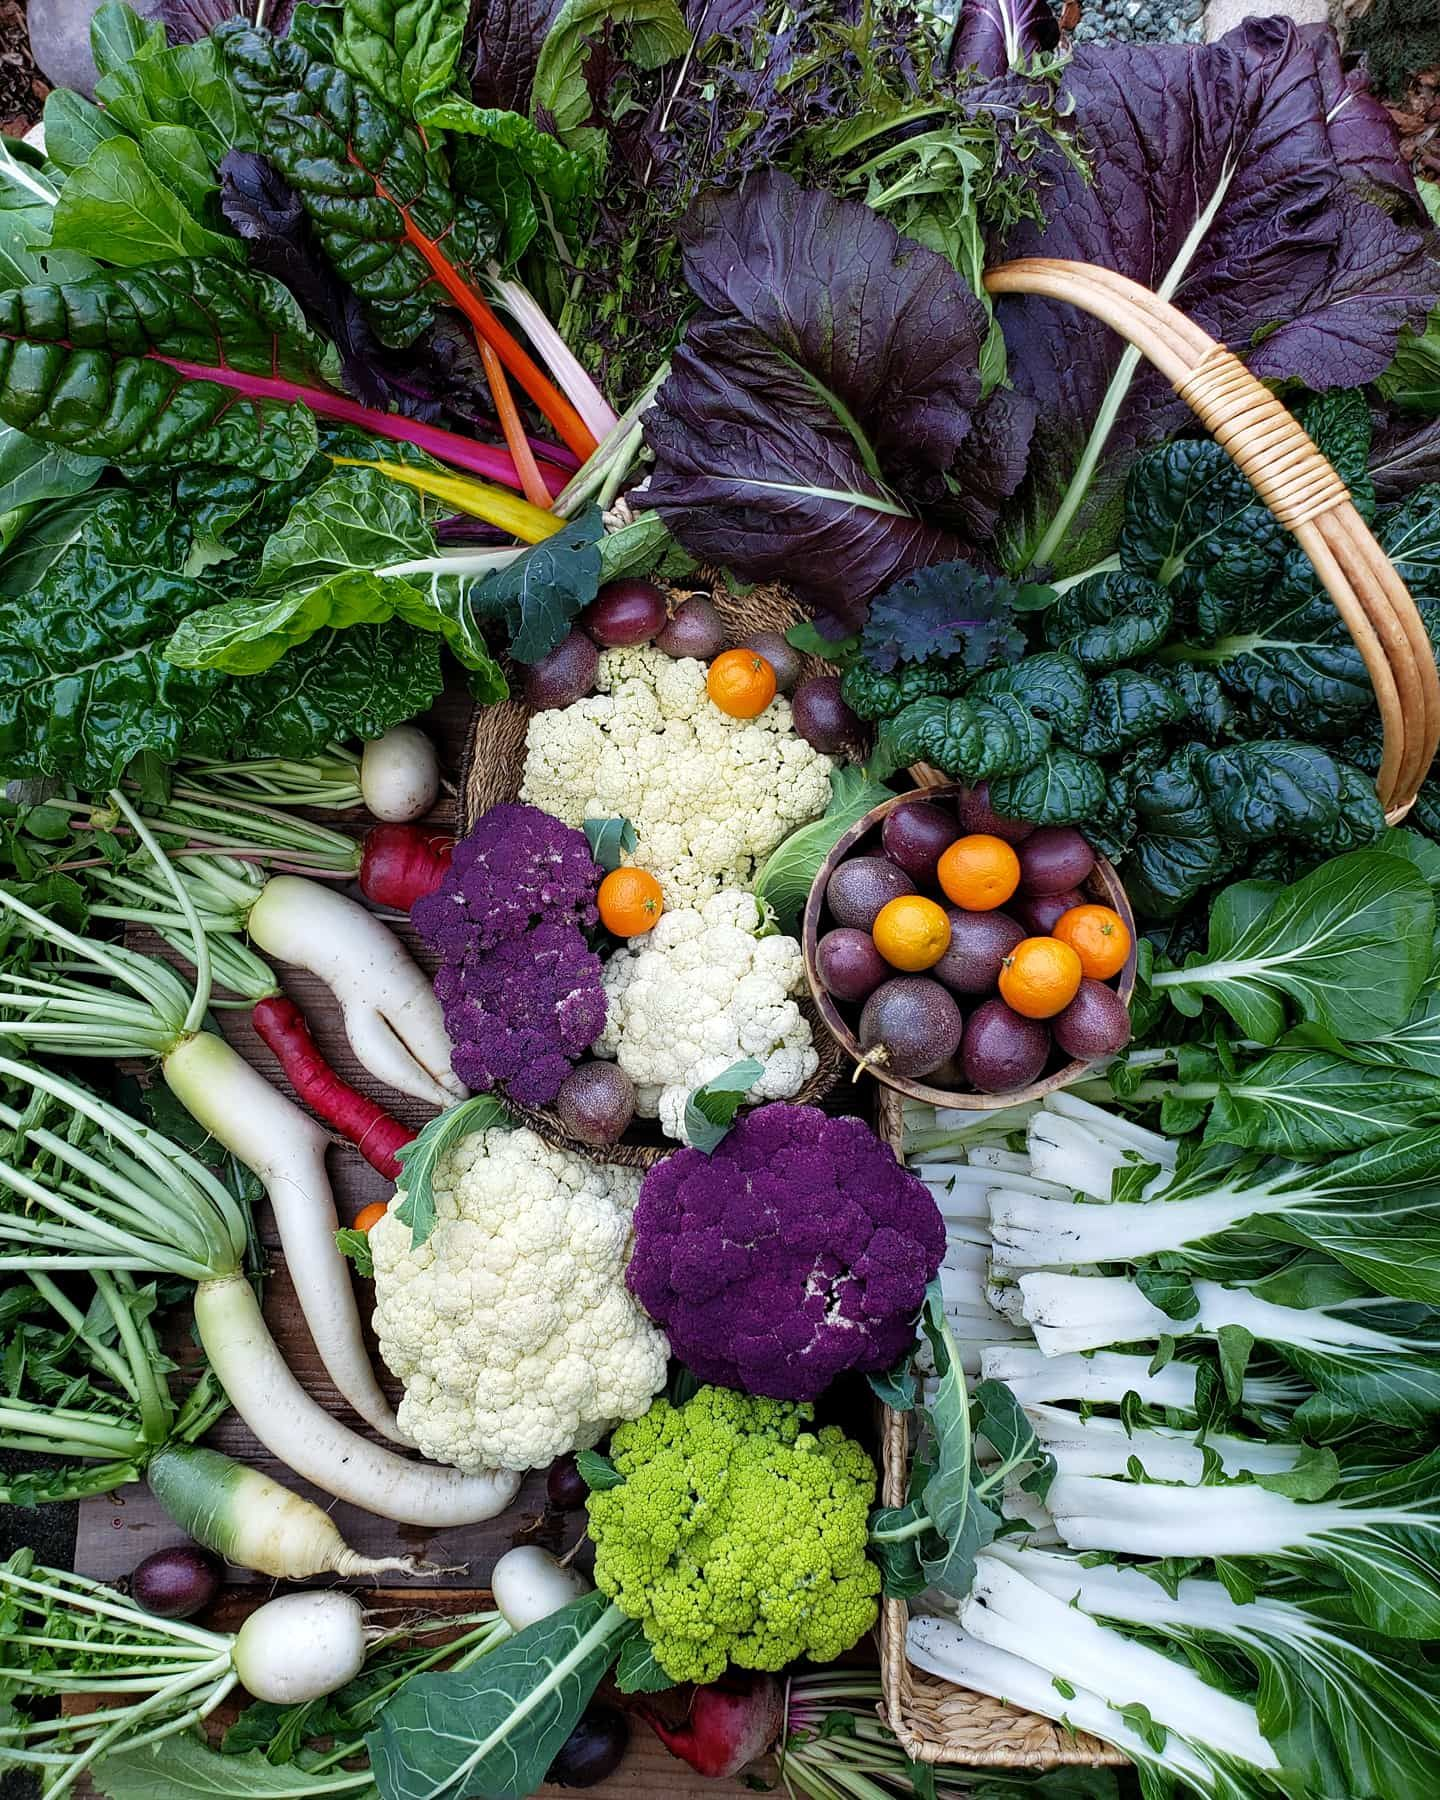 Best Vegetables For A Fall Garden: Starting A Fall Garden: Cool Season Vegetable Varieties To